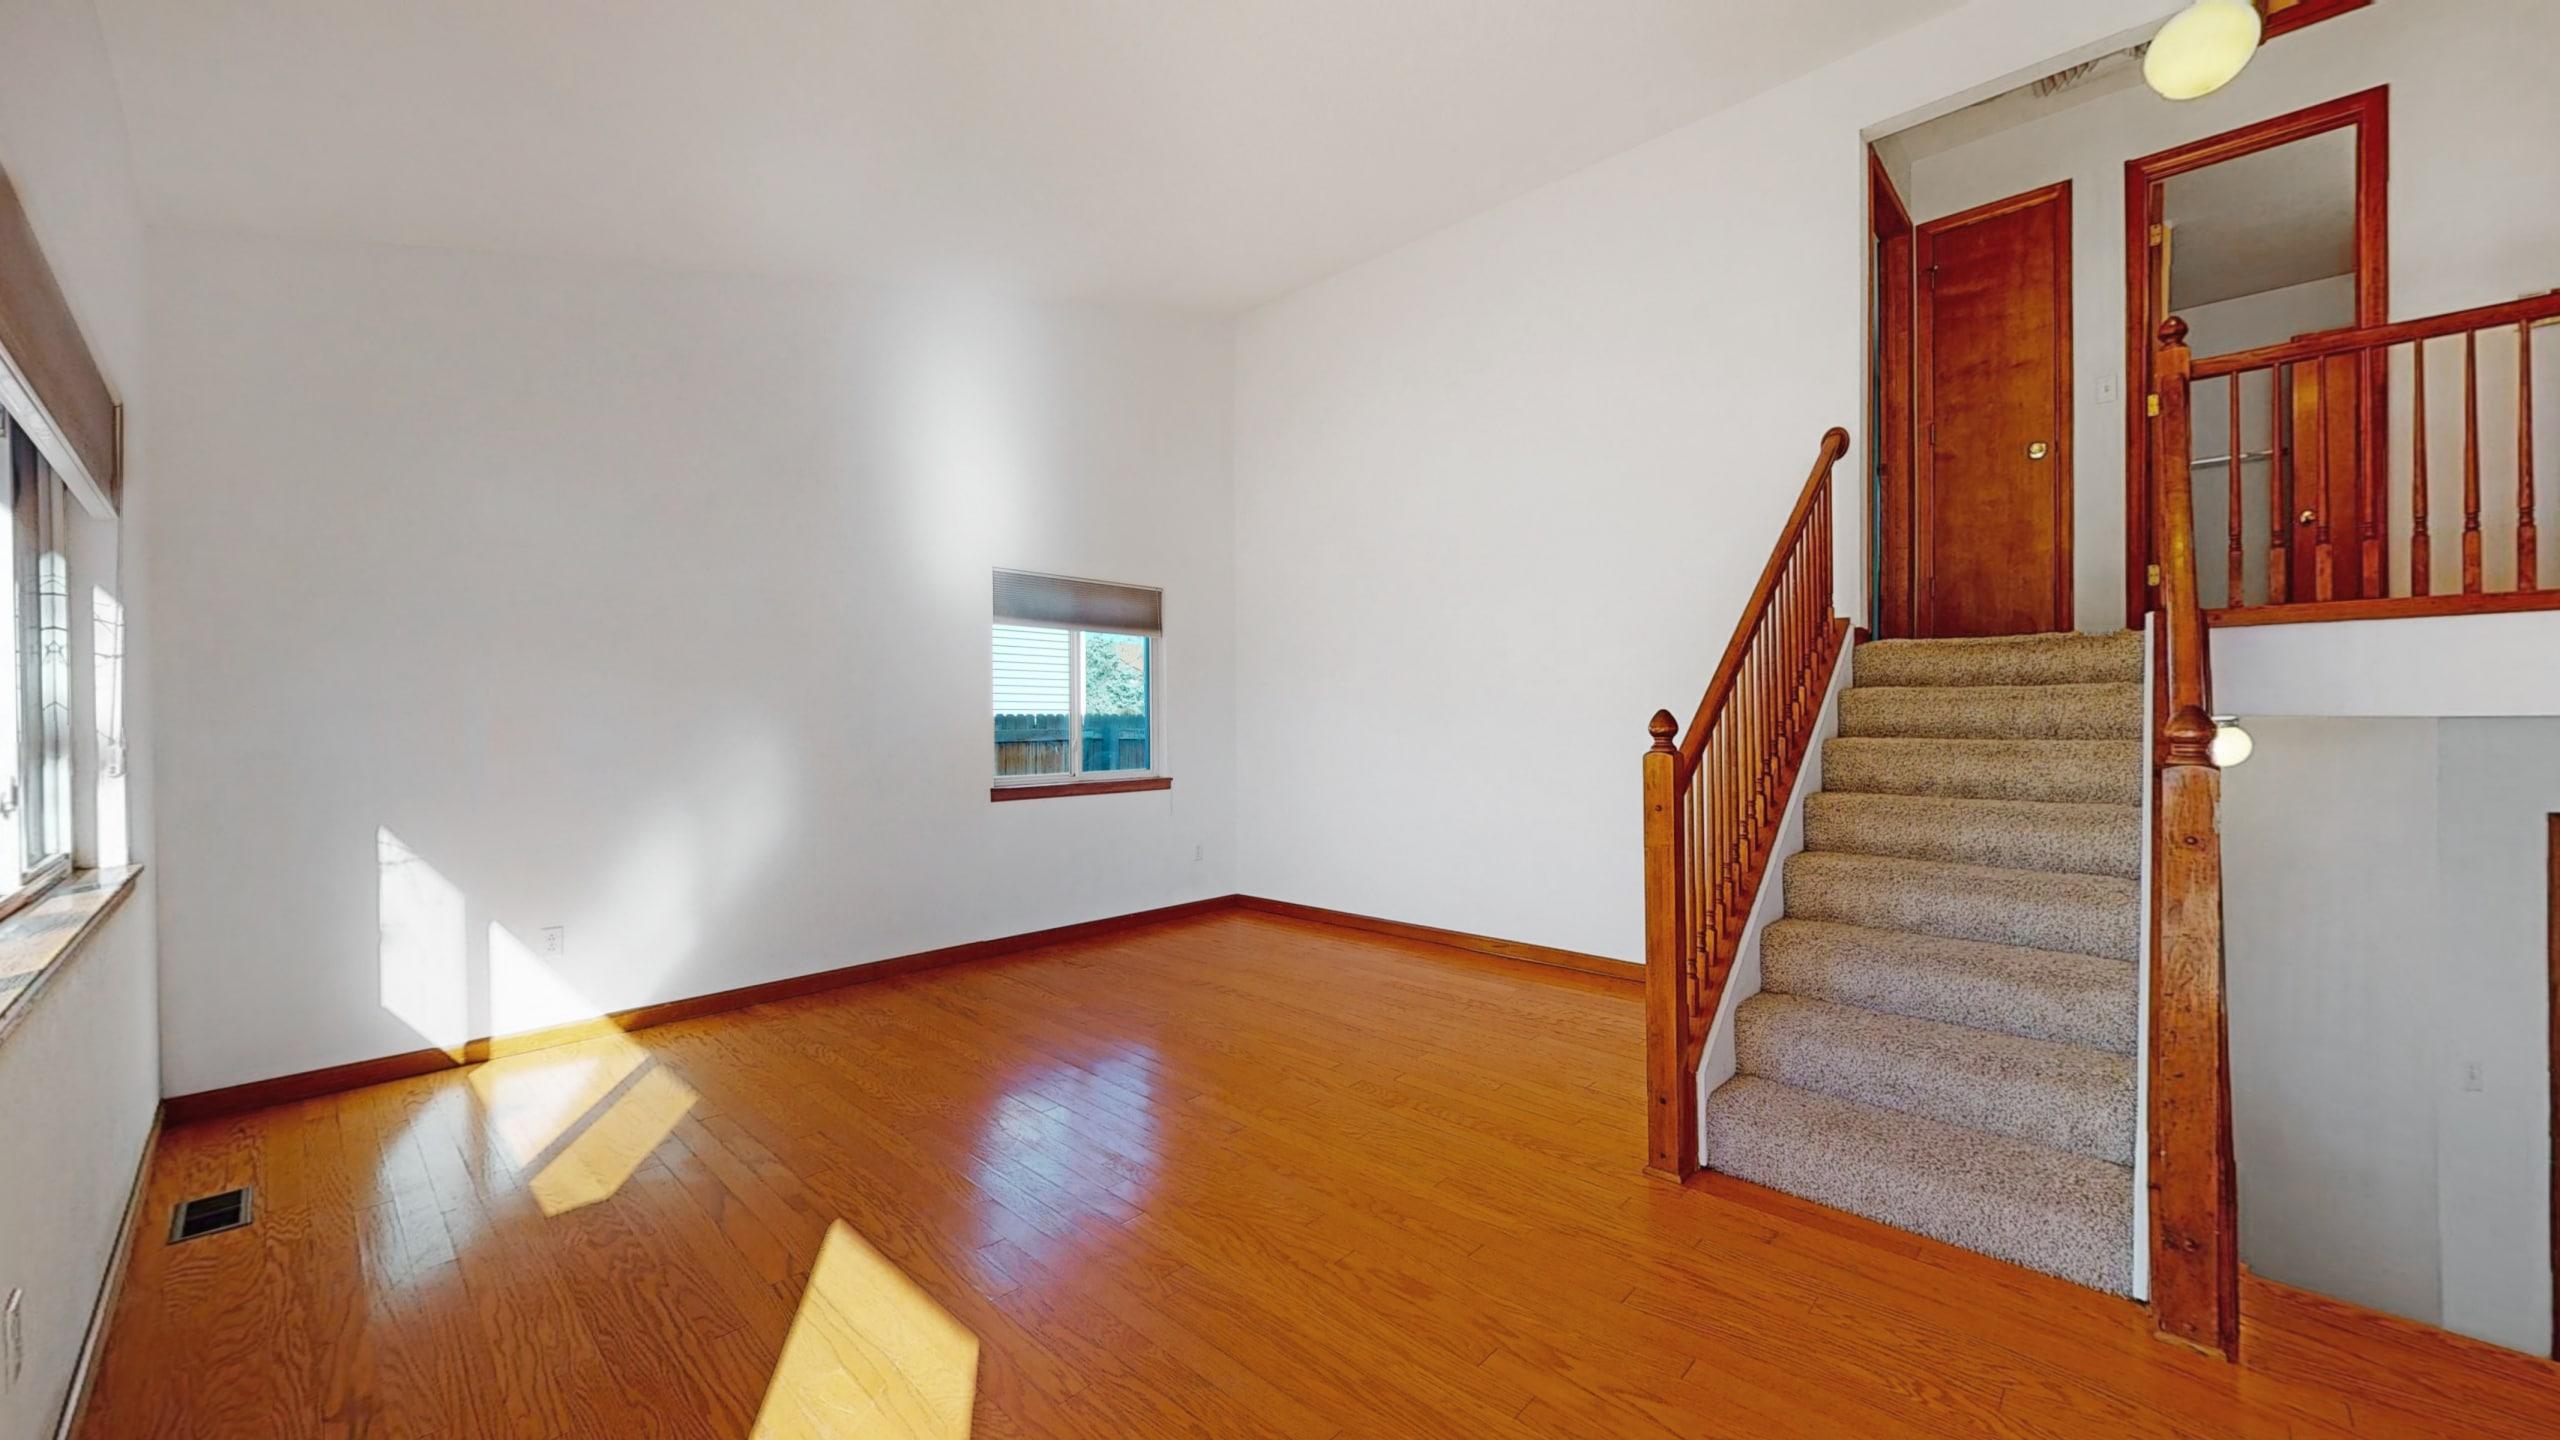 Wood floors, wood banister, white walls, large window